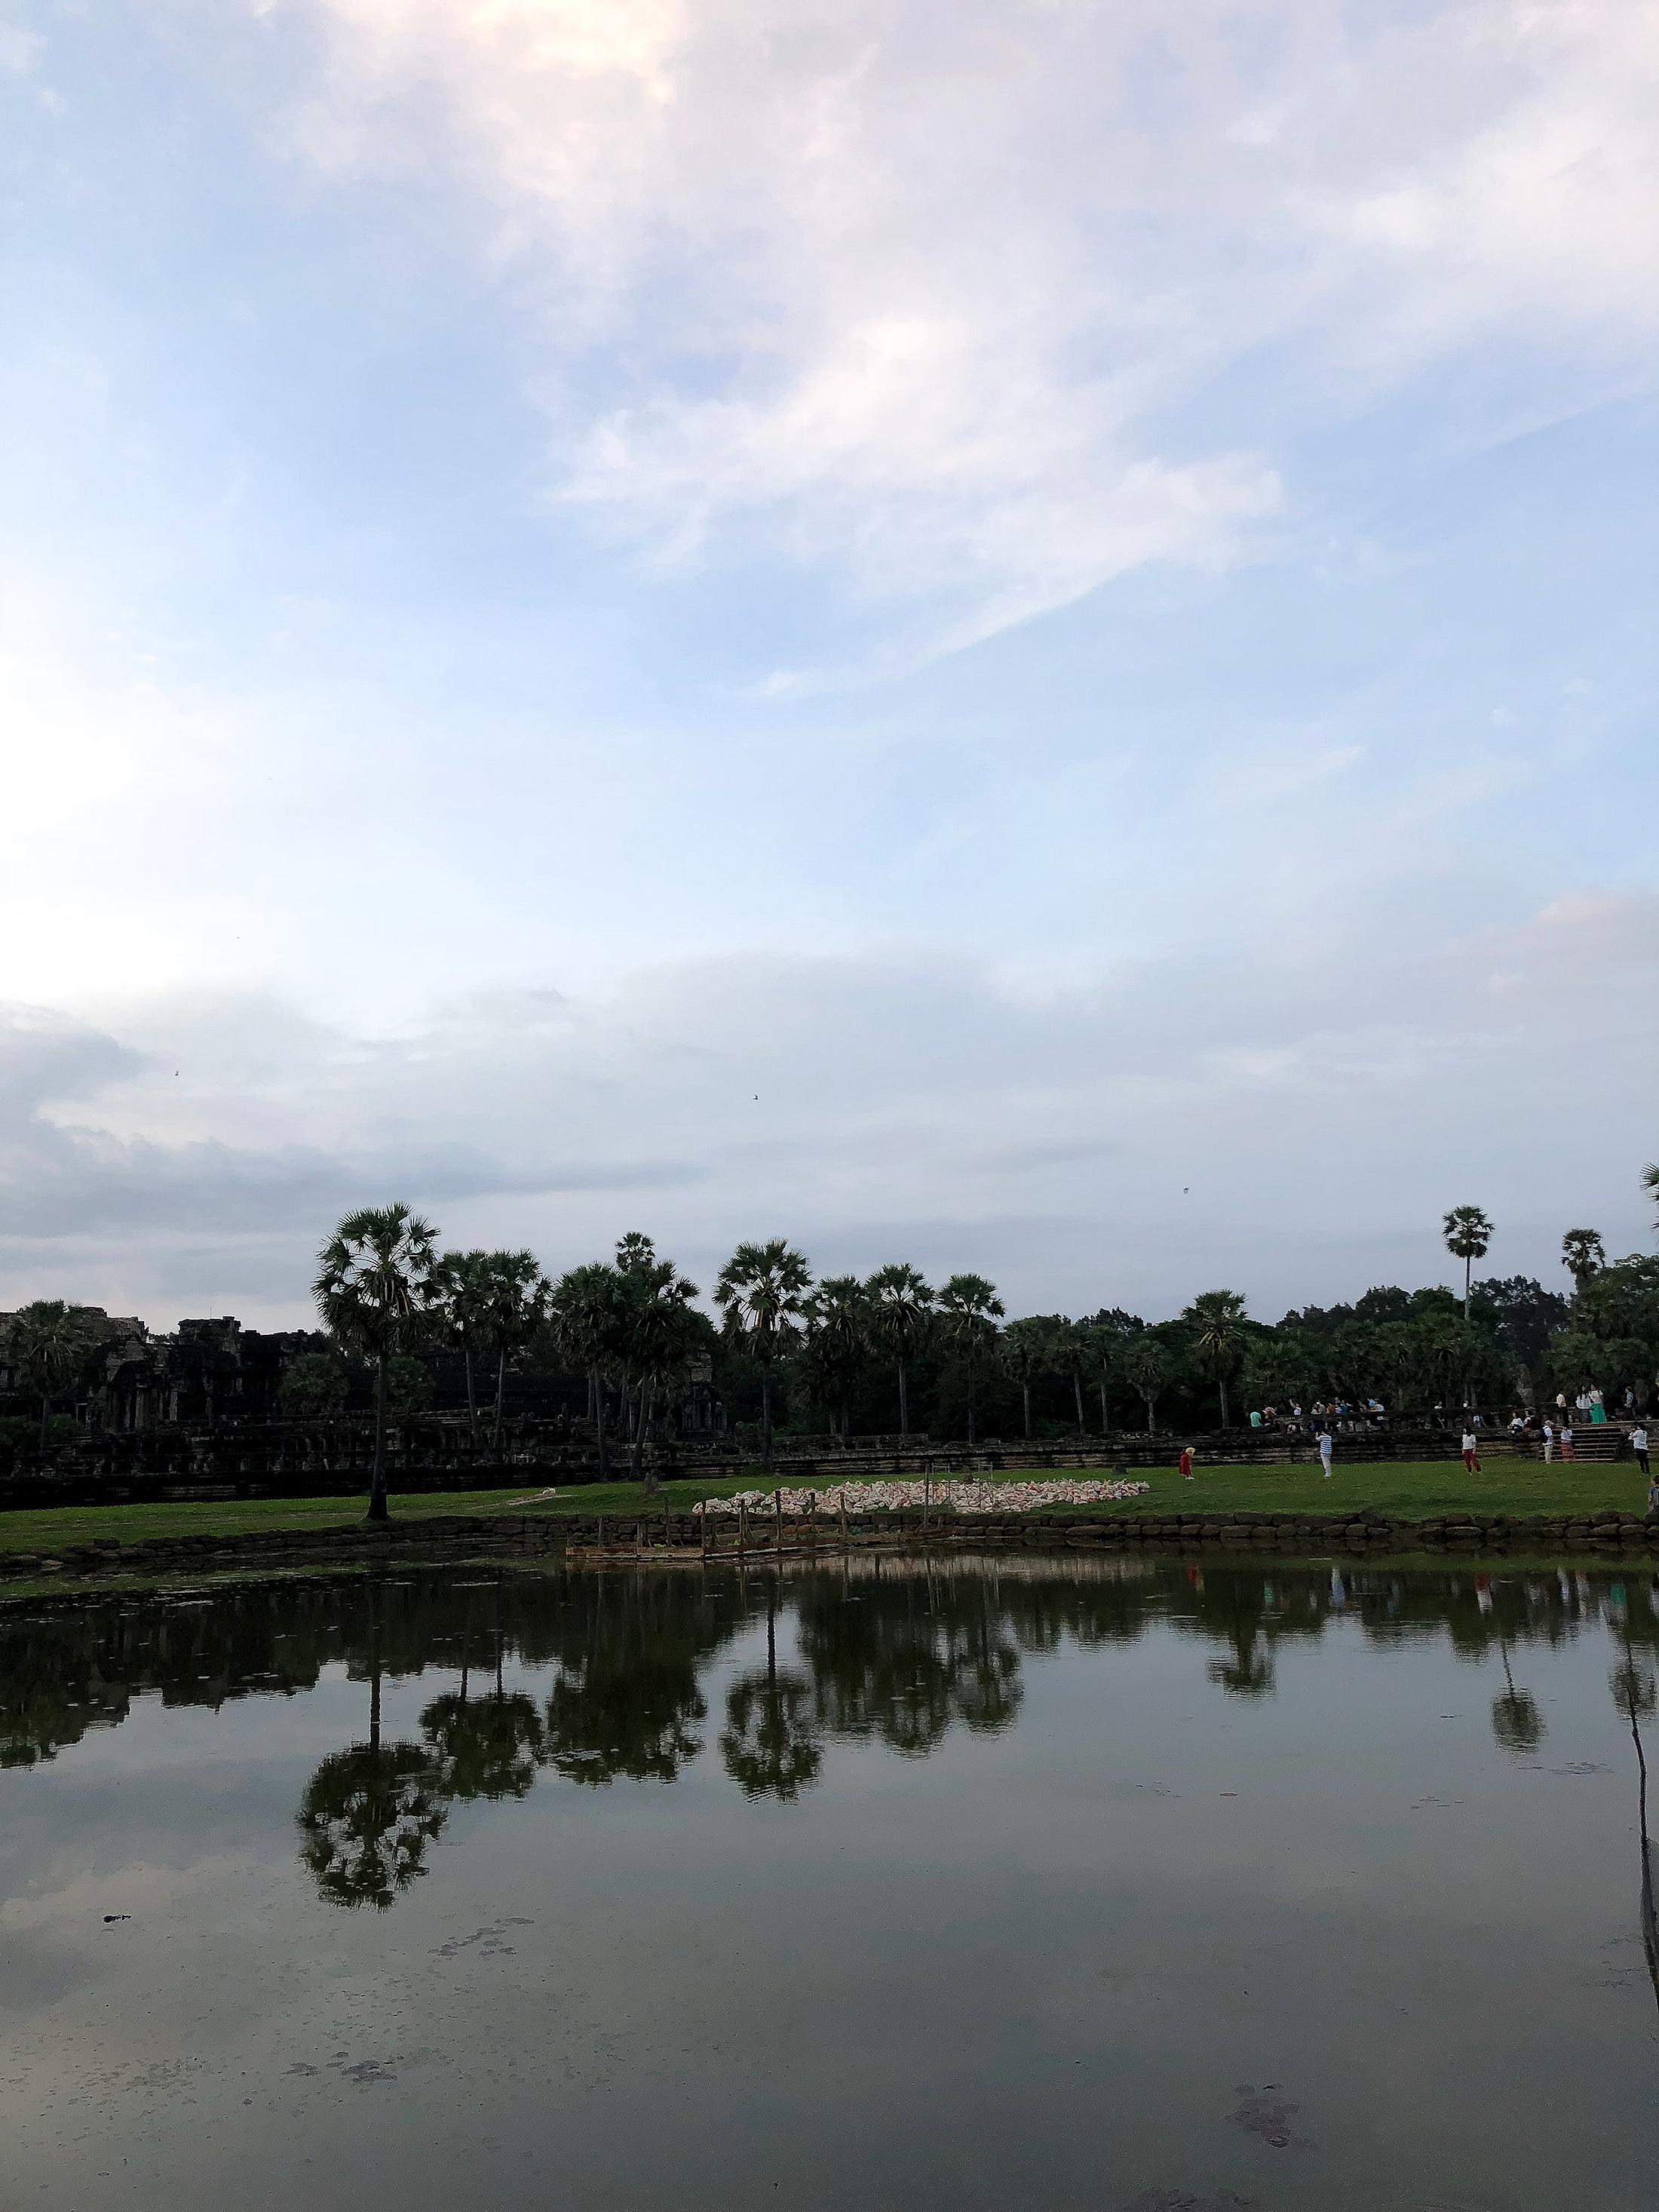 angkor wat cambodia photo diary_3700